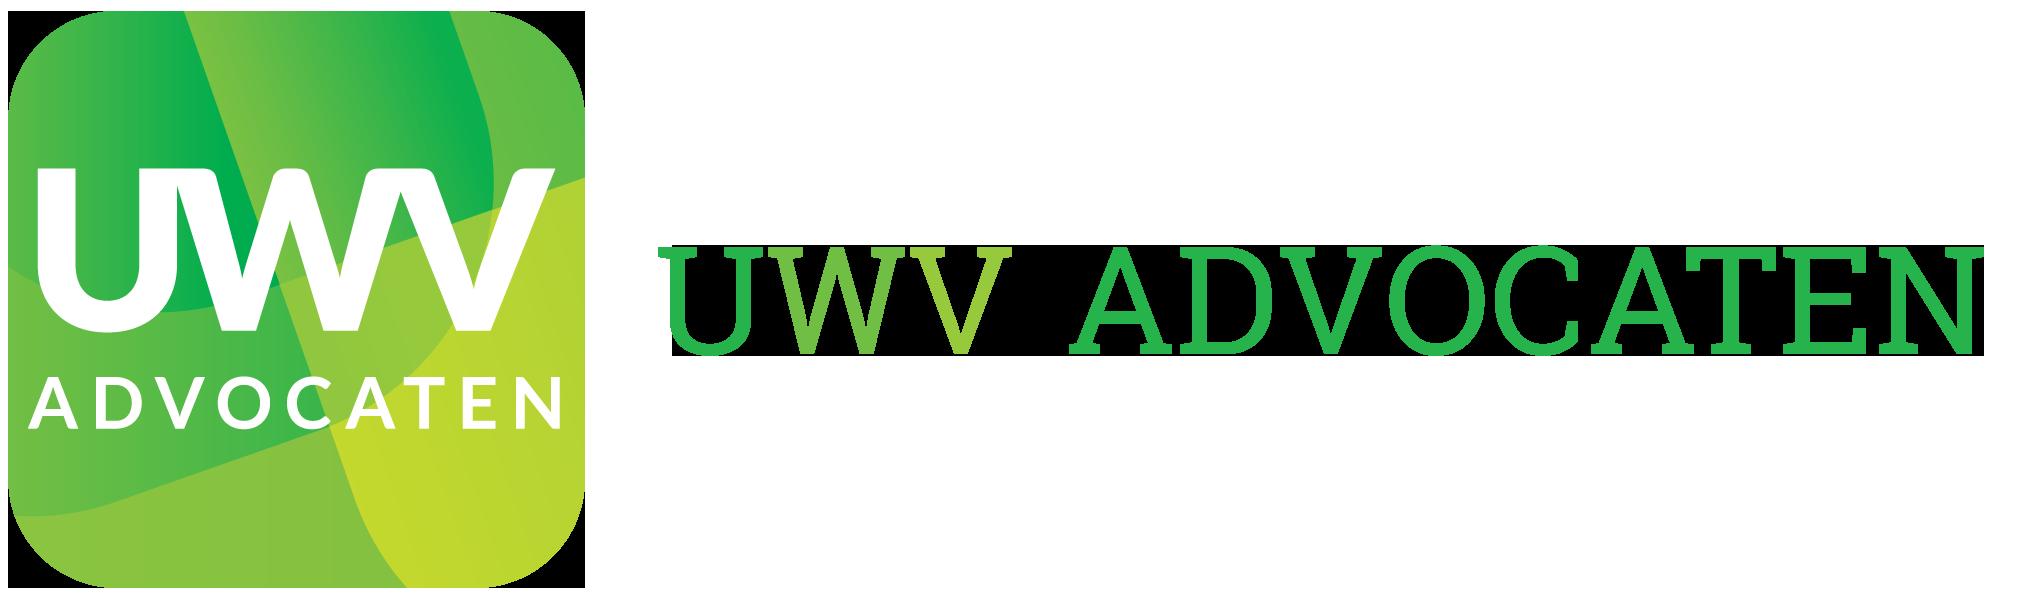 UWV Advocaten